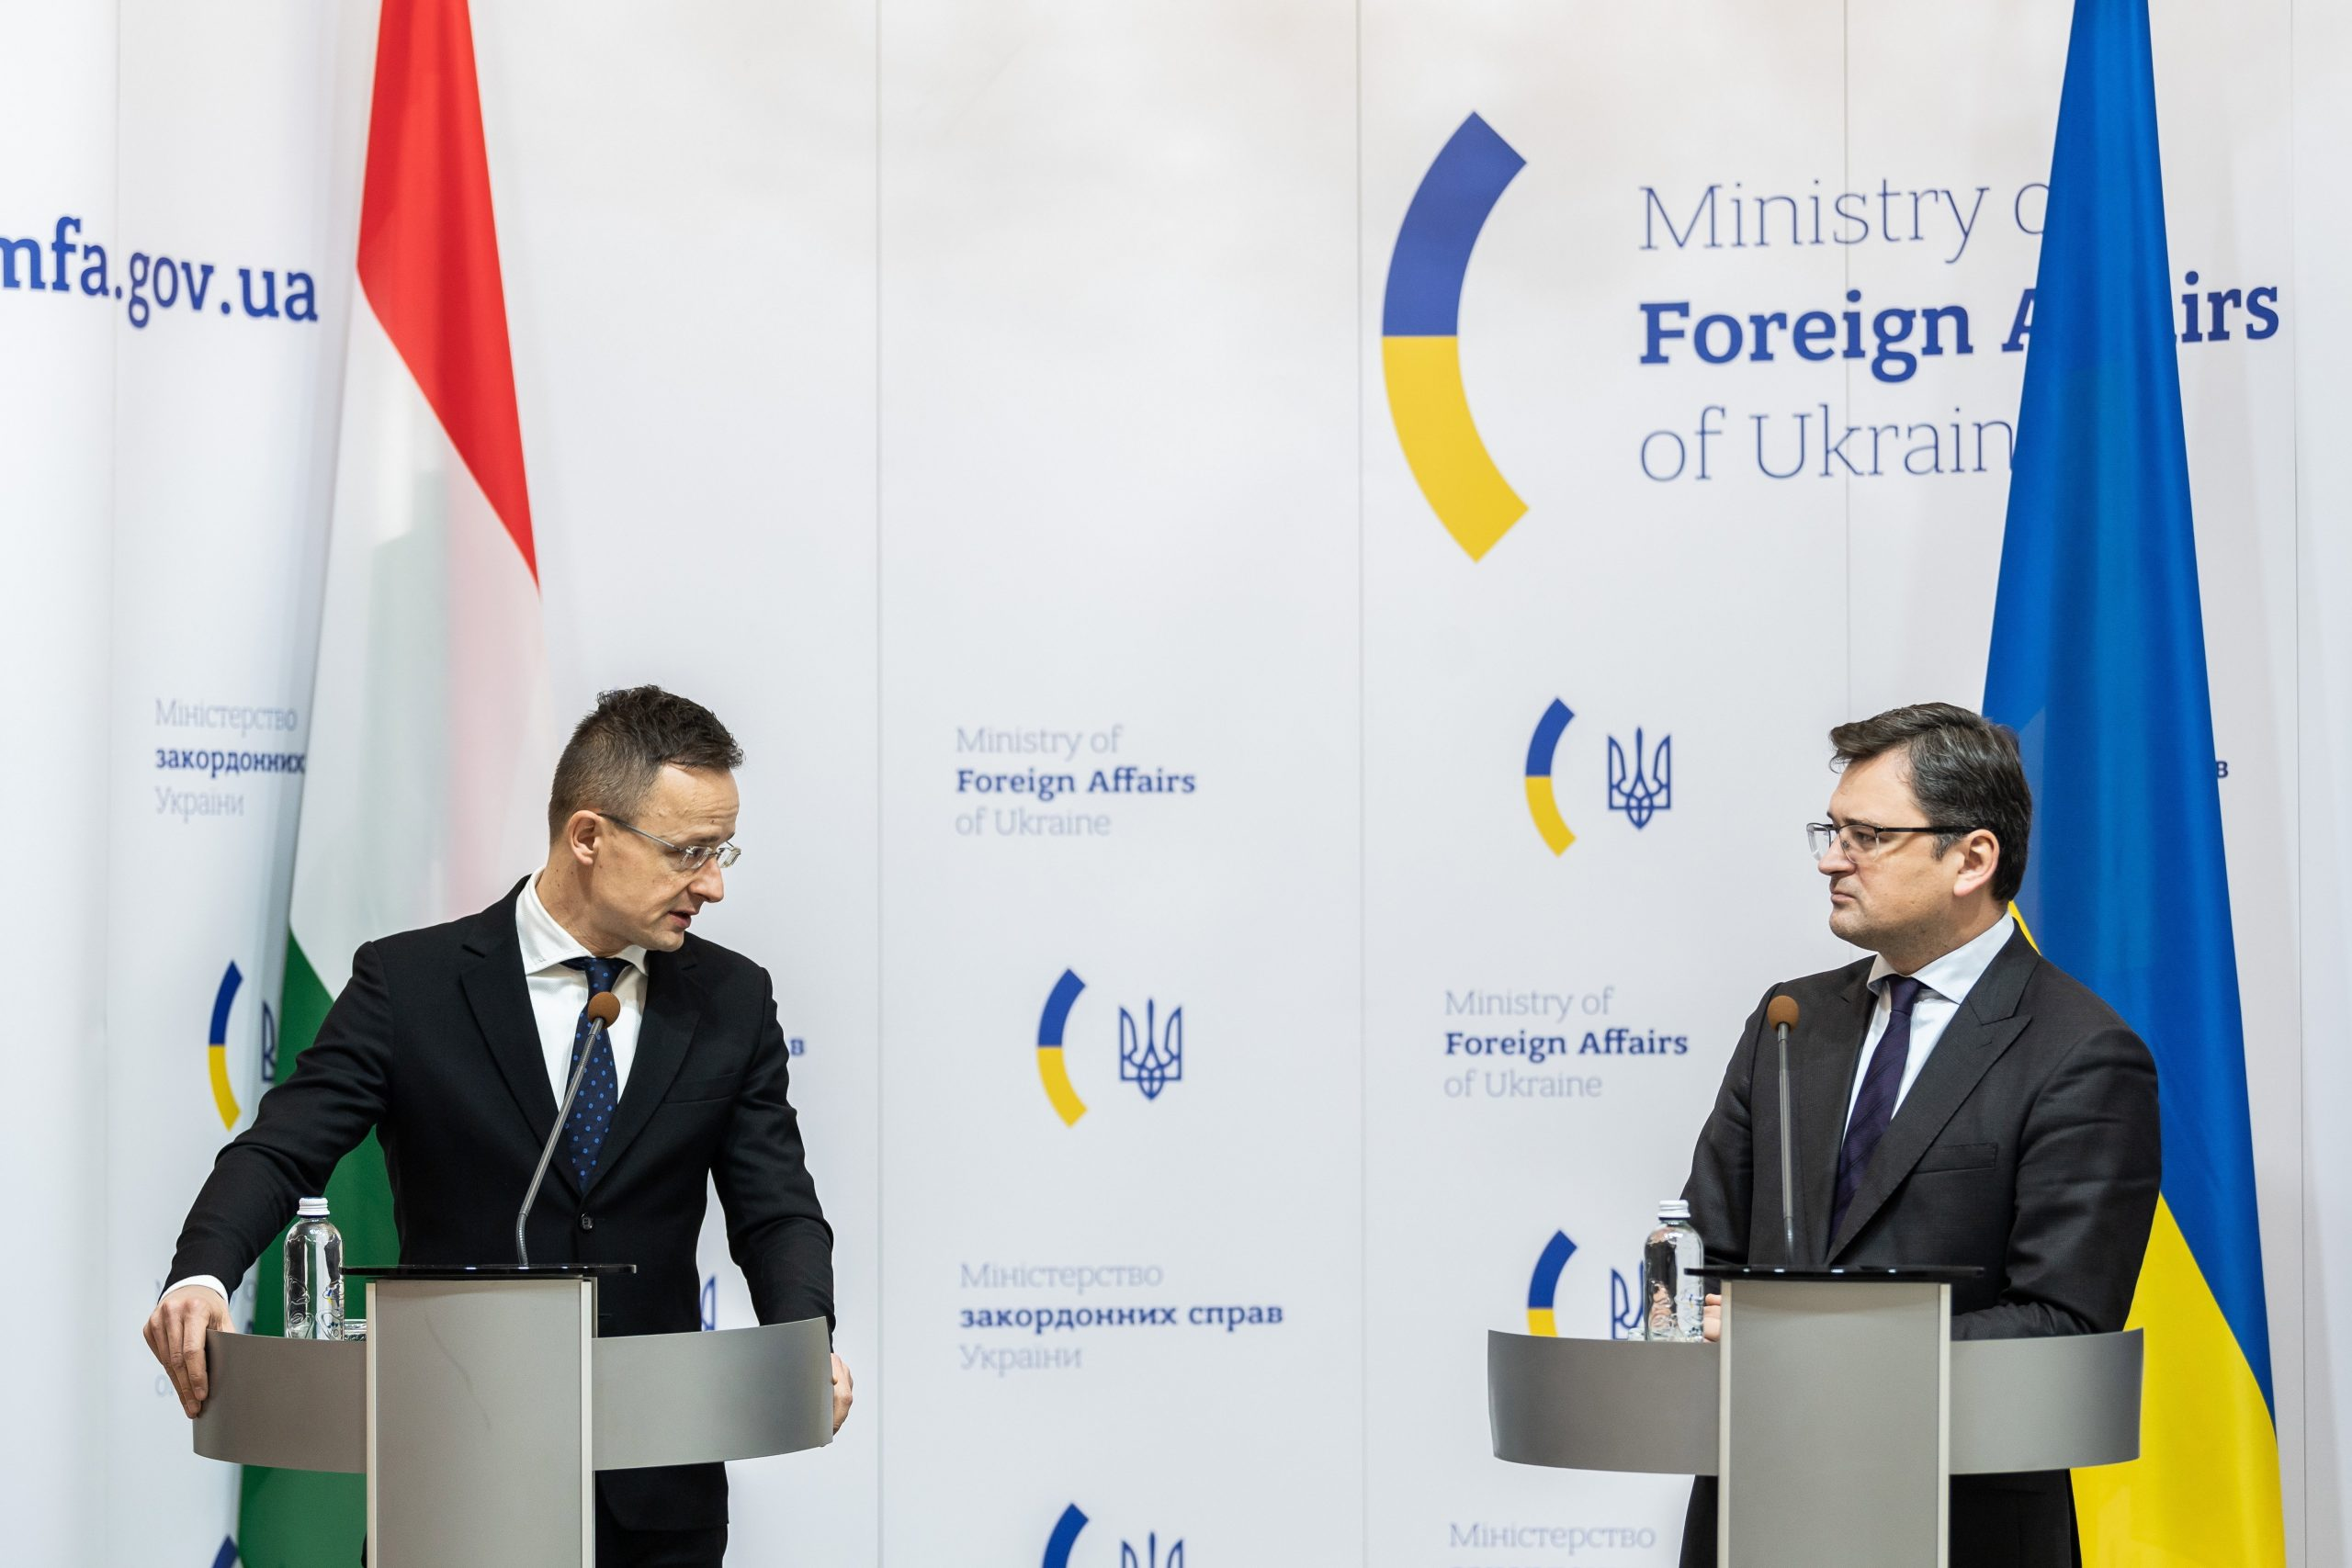 FM Szijjártó: 'Extreme Elements' Must Be Cut from Hungary-Ukraine Ties